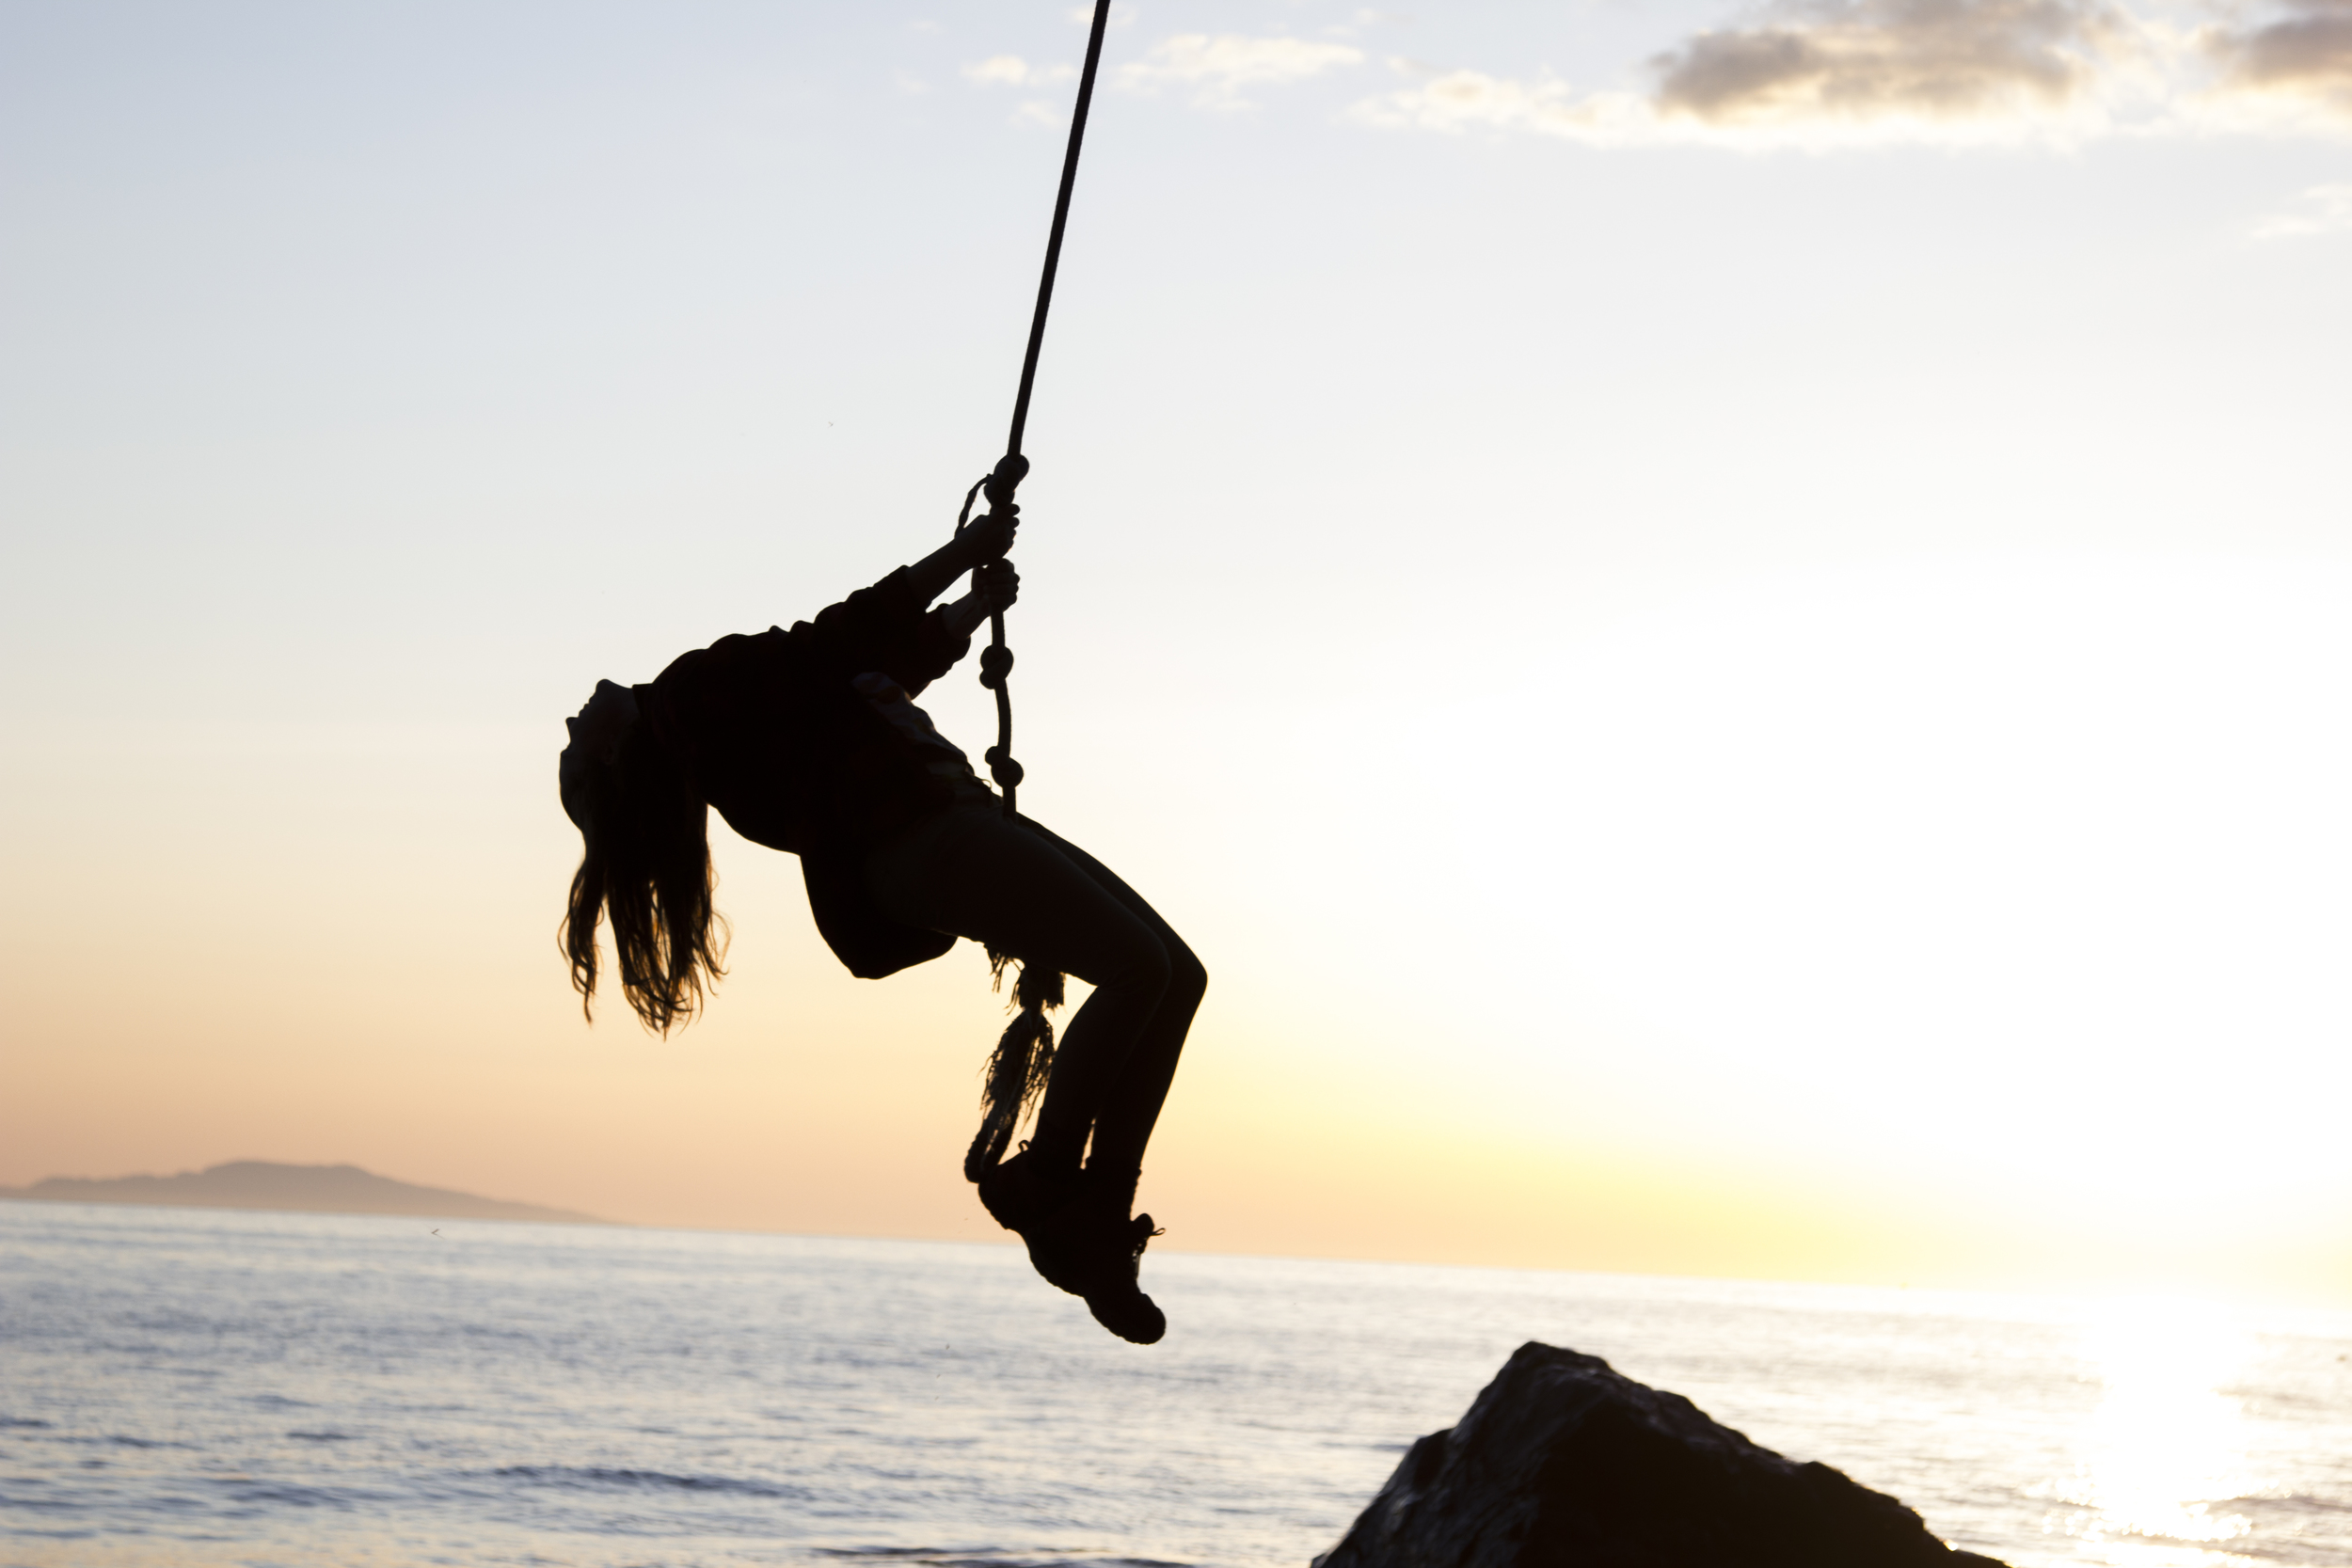 rachael swing.jpg